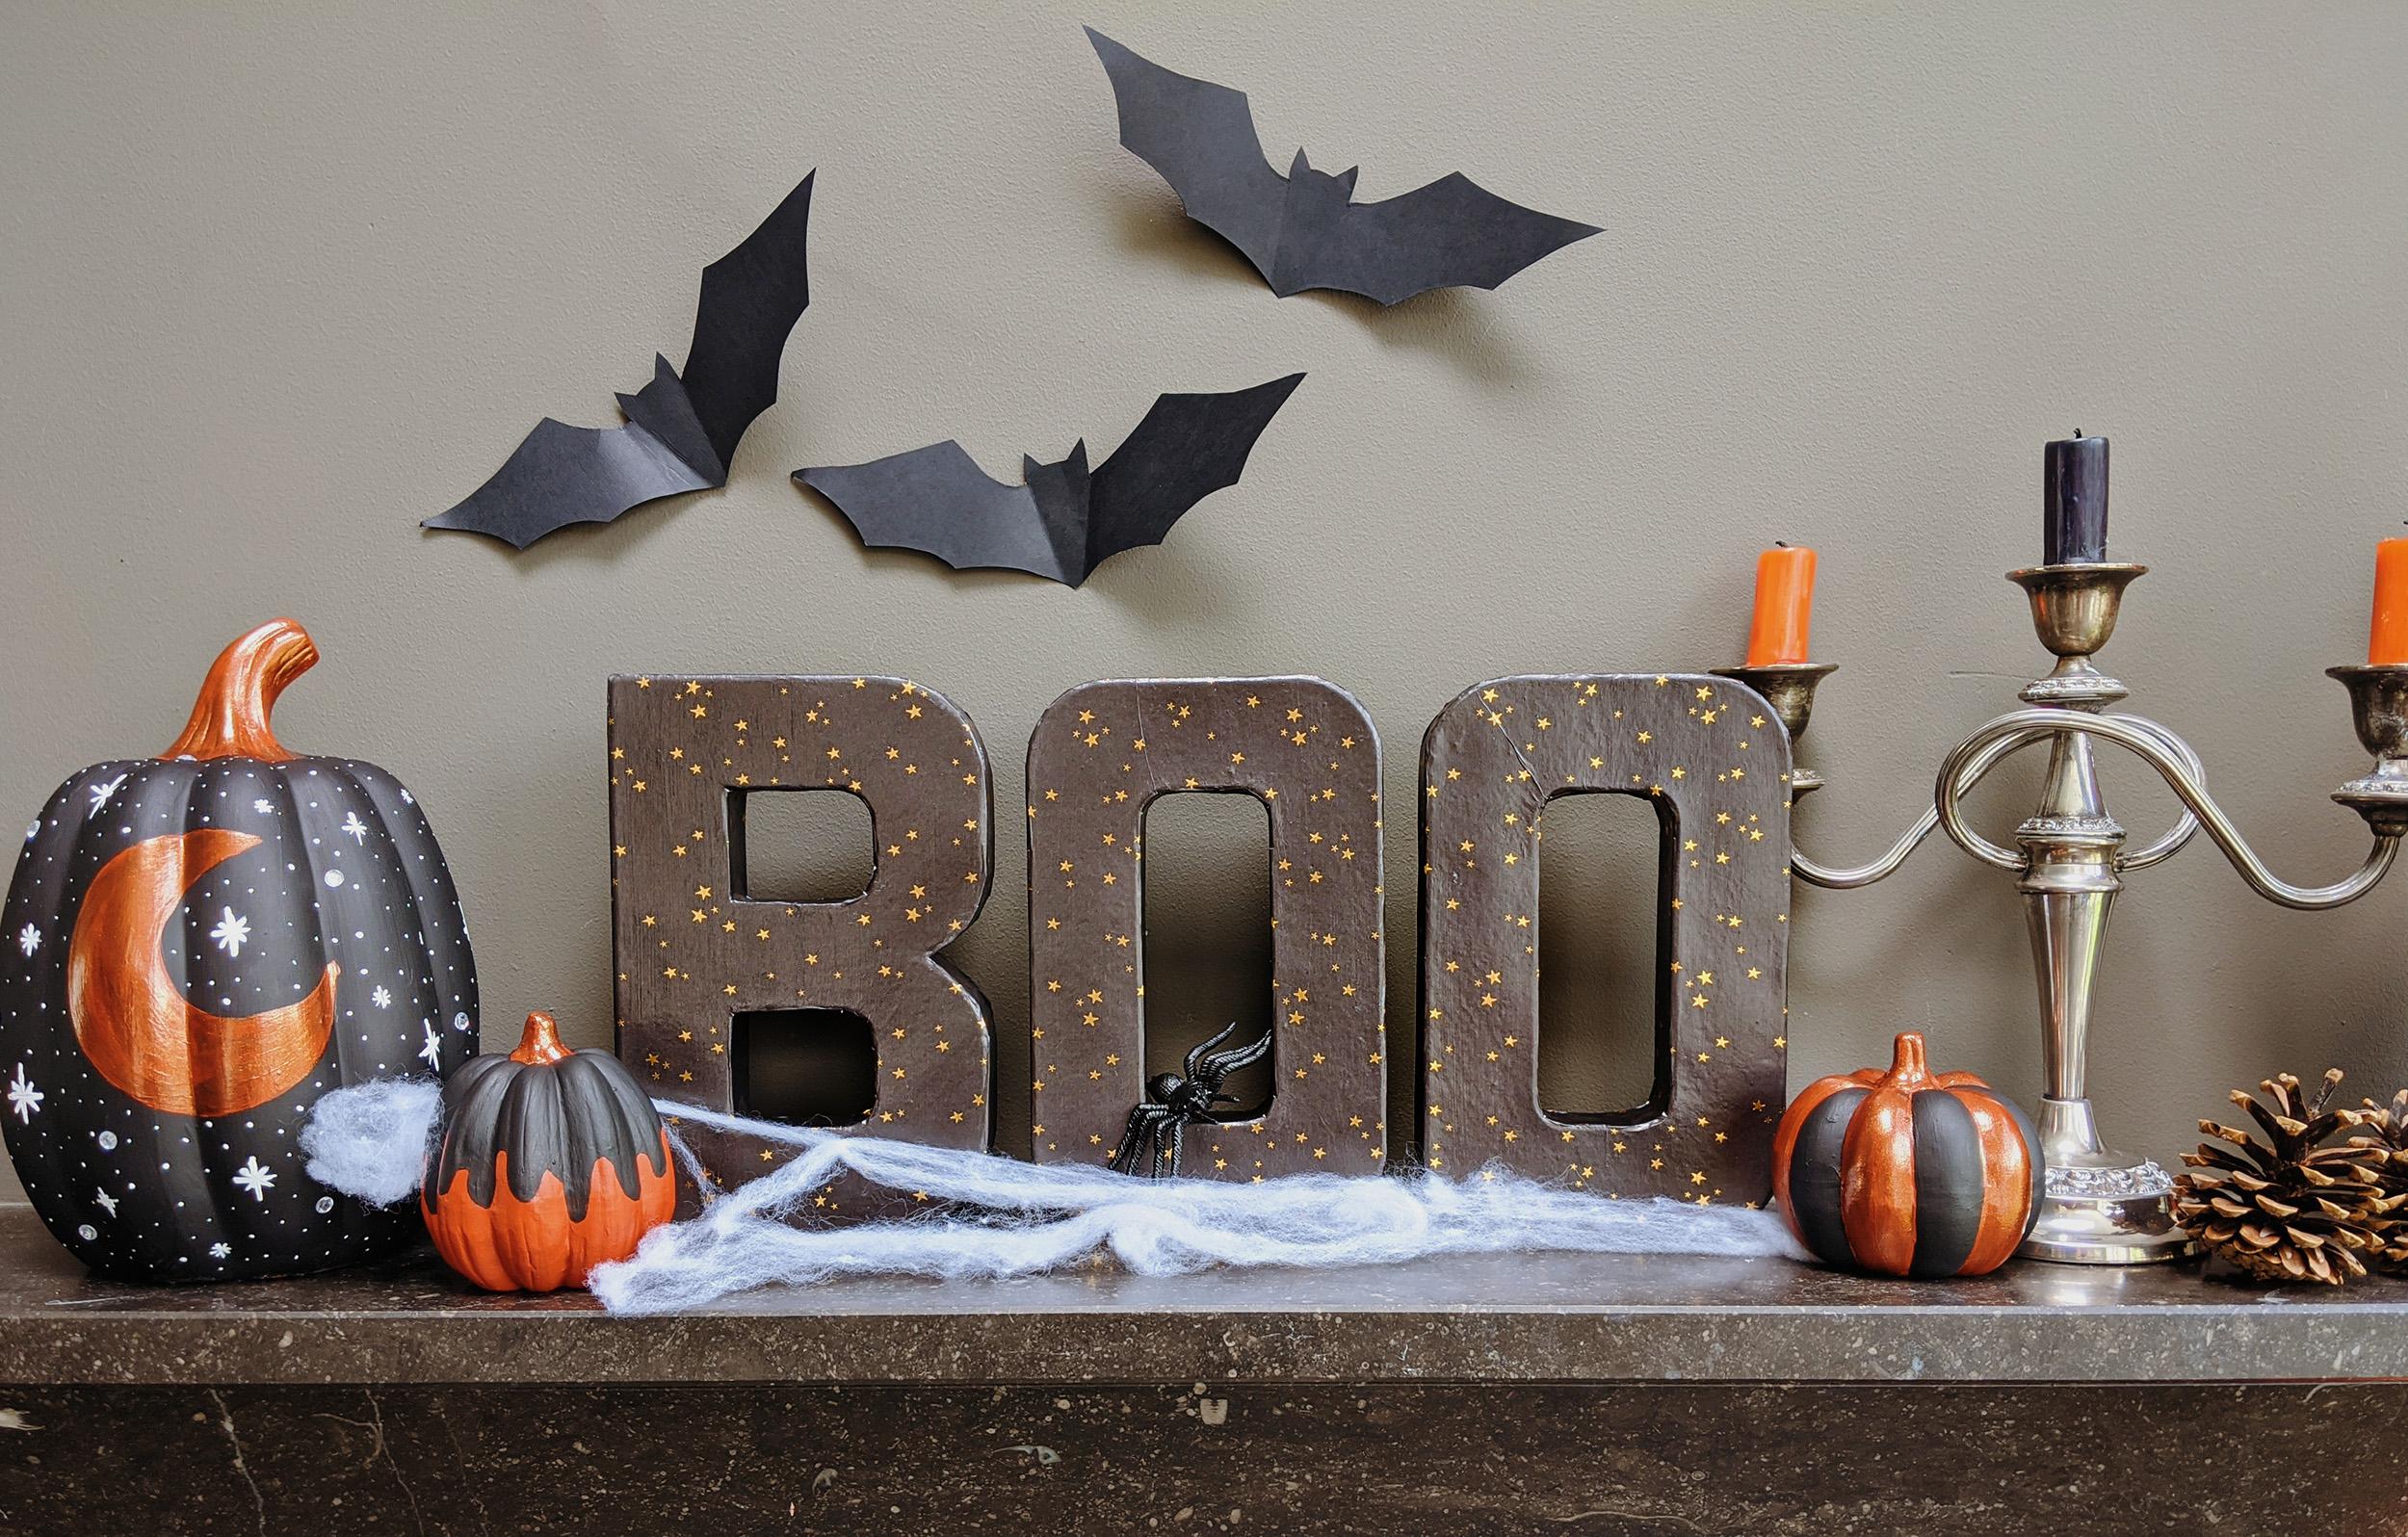 oktoberdots papier-maché letters halloween boo